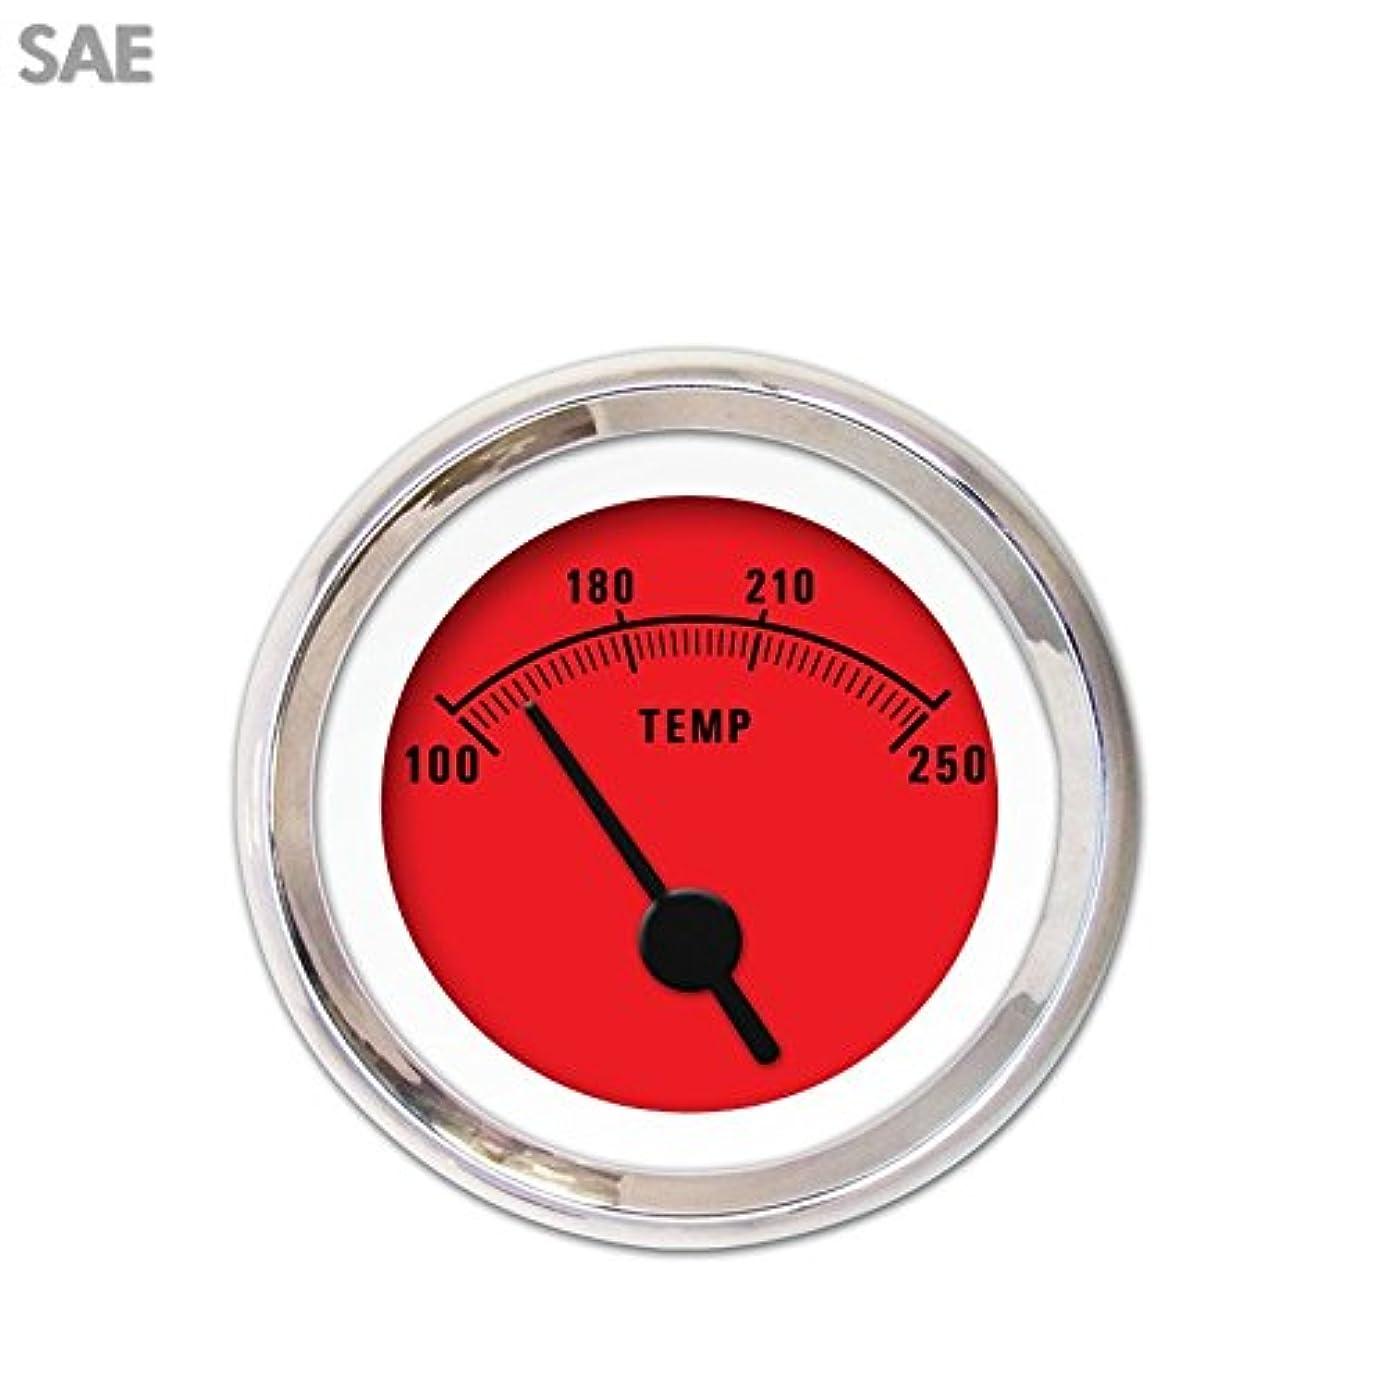 Aurora Instruments 3327 Rider Red SAE Water Temperature Gauge (Black Vintage Needles, Chrome Trim Rings, Style Kit DIY Install)